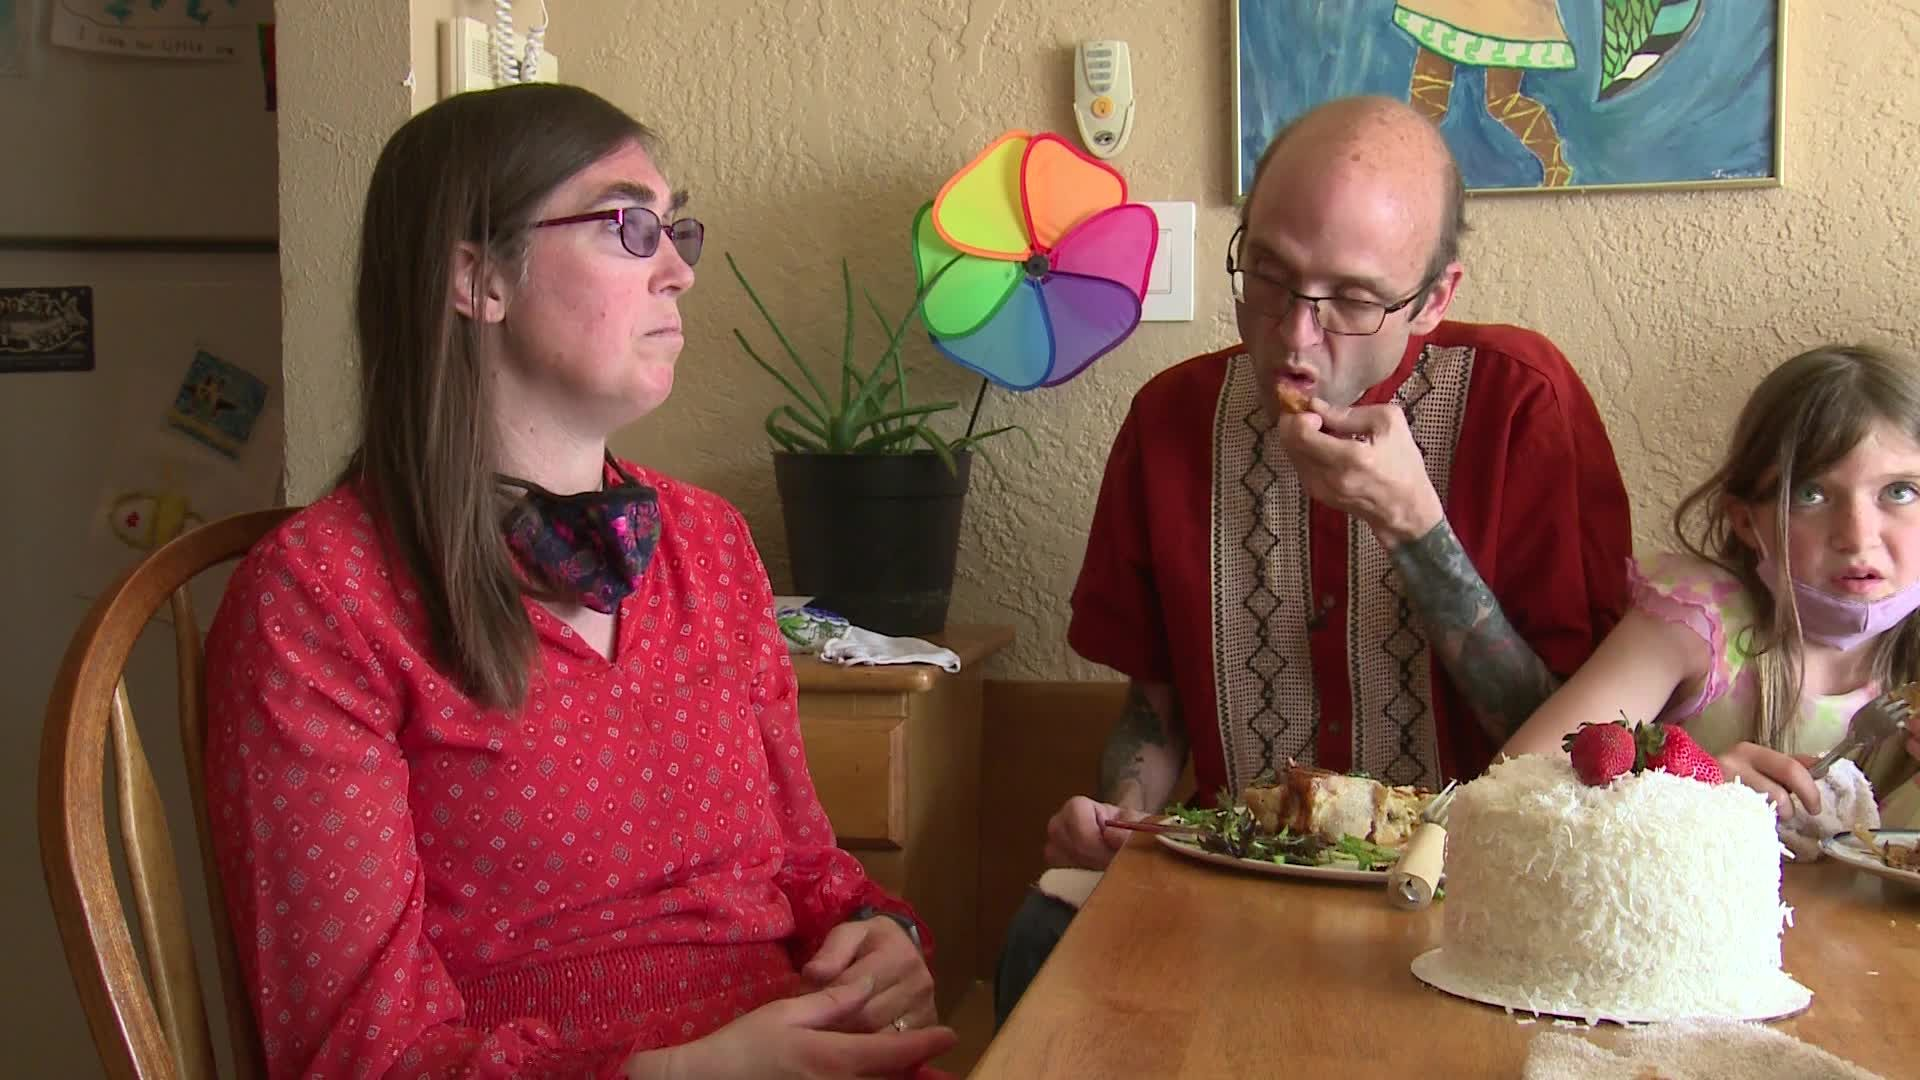 news.yahoo.com: Local chefs step forward to help fulfill Albuquerque's man's bucket list